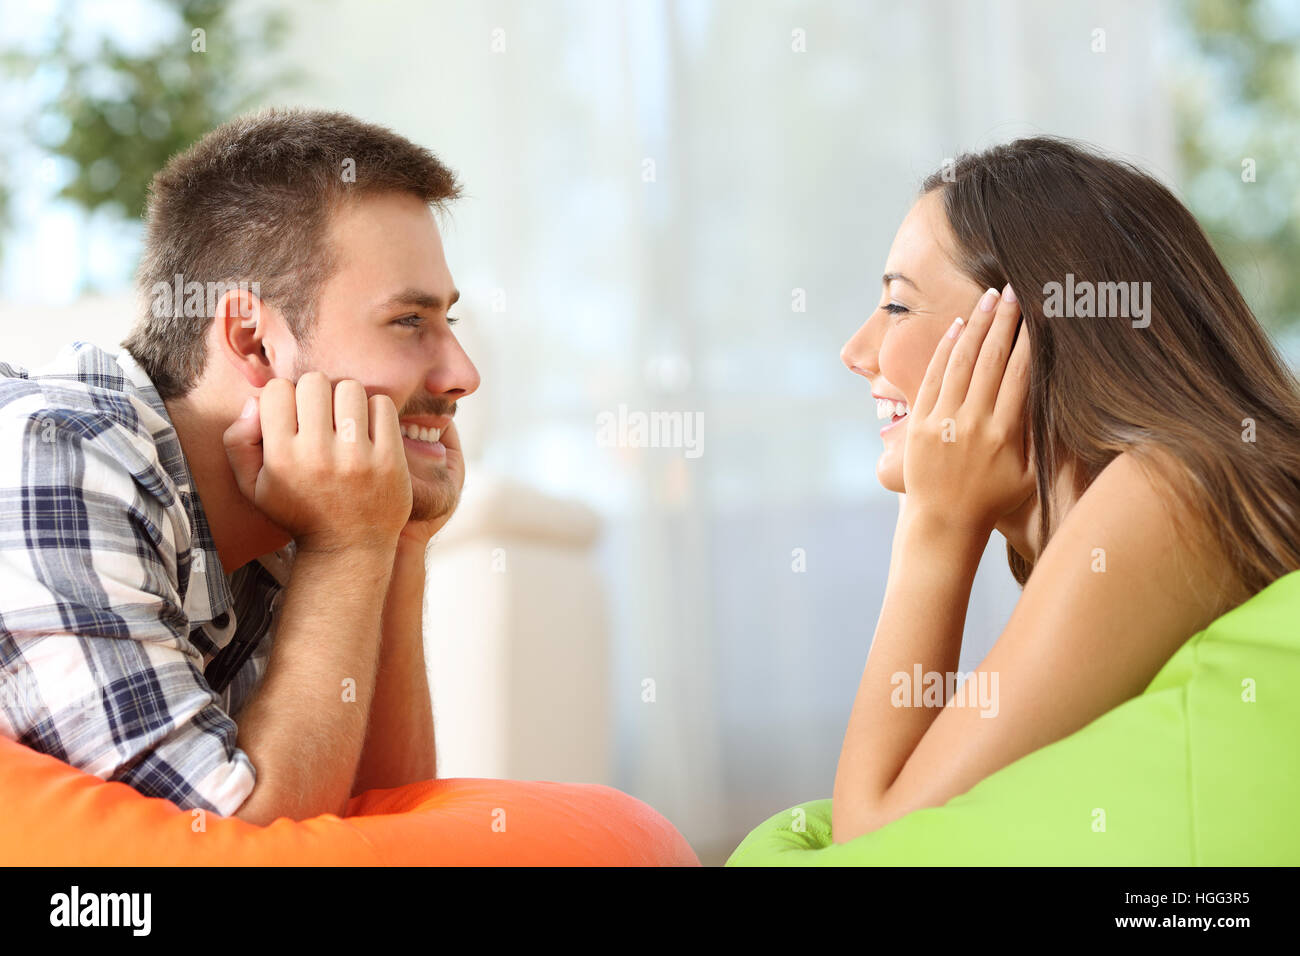 Who is nina dobrev dating history